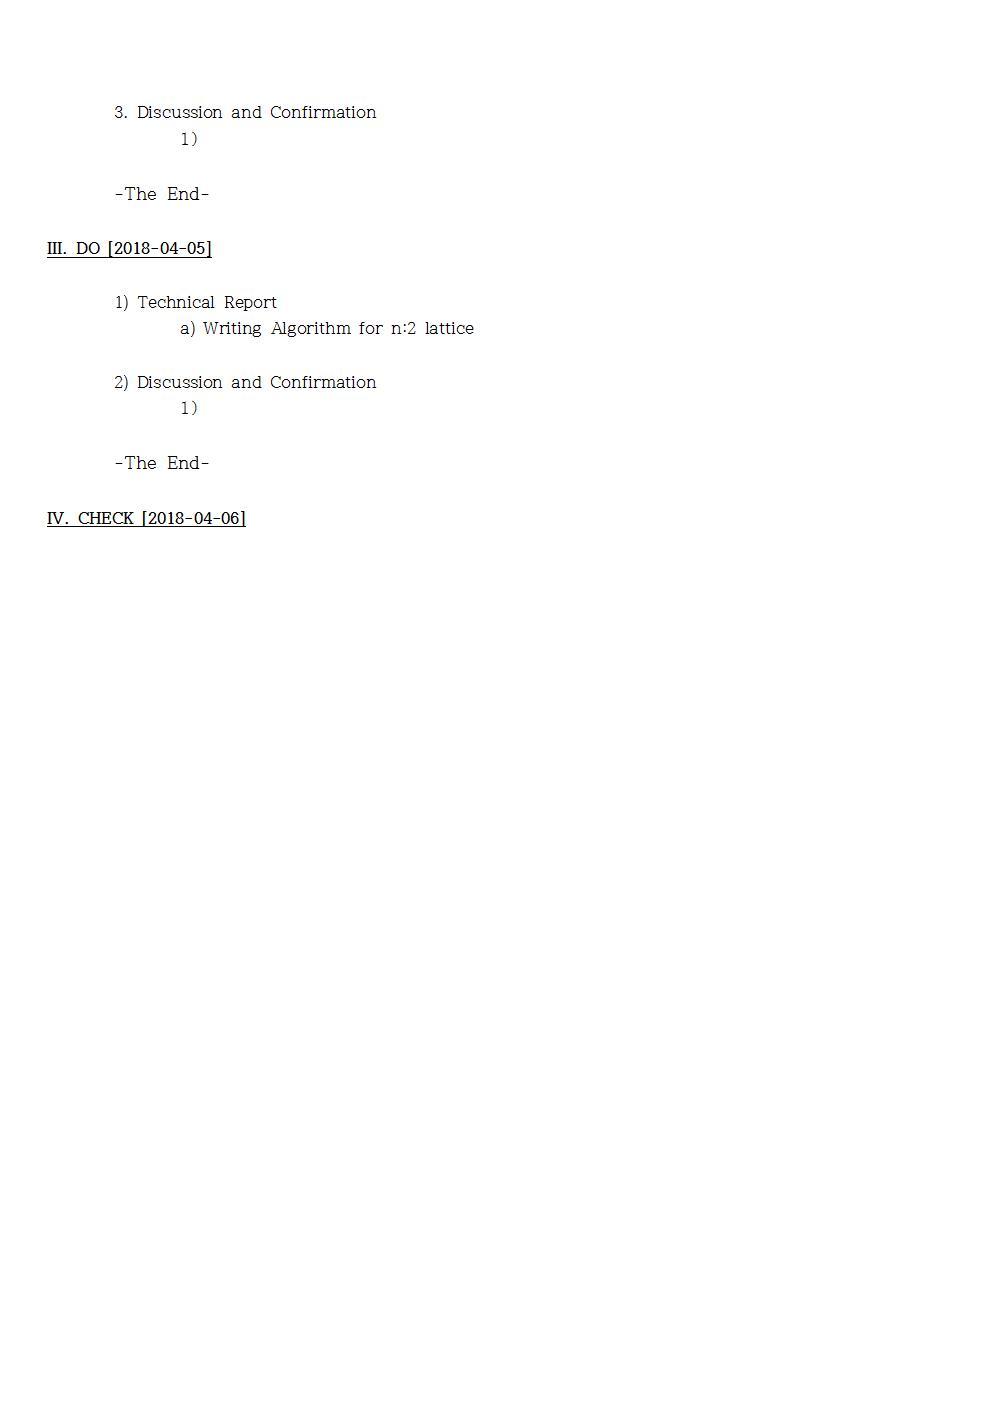 D-[18-002-RD-02]-[PRISM2.0-ADOxx]-[2018-04-05]-[MR]002.jpg